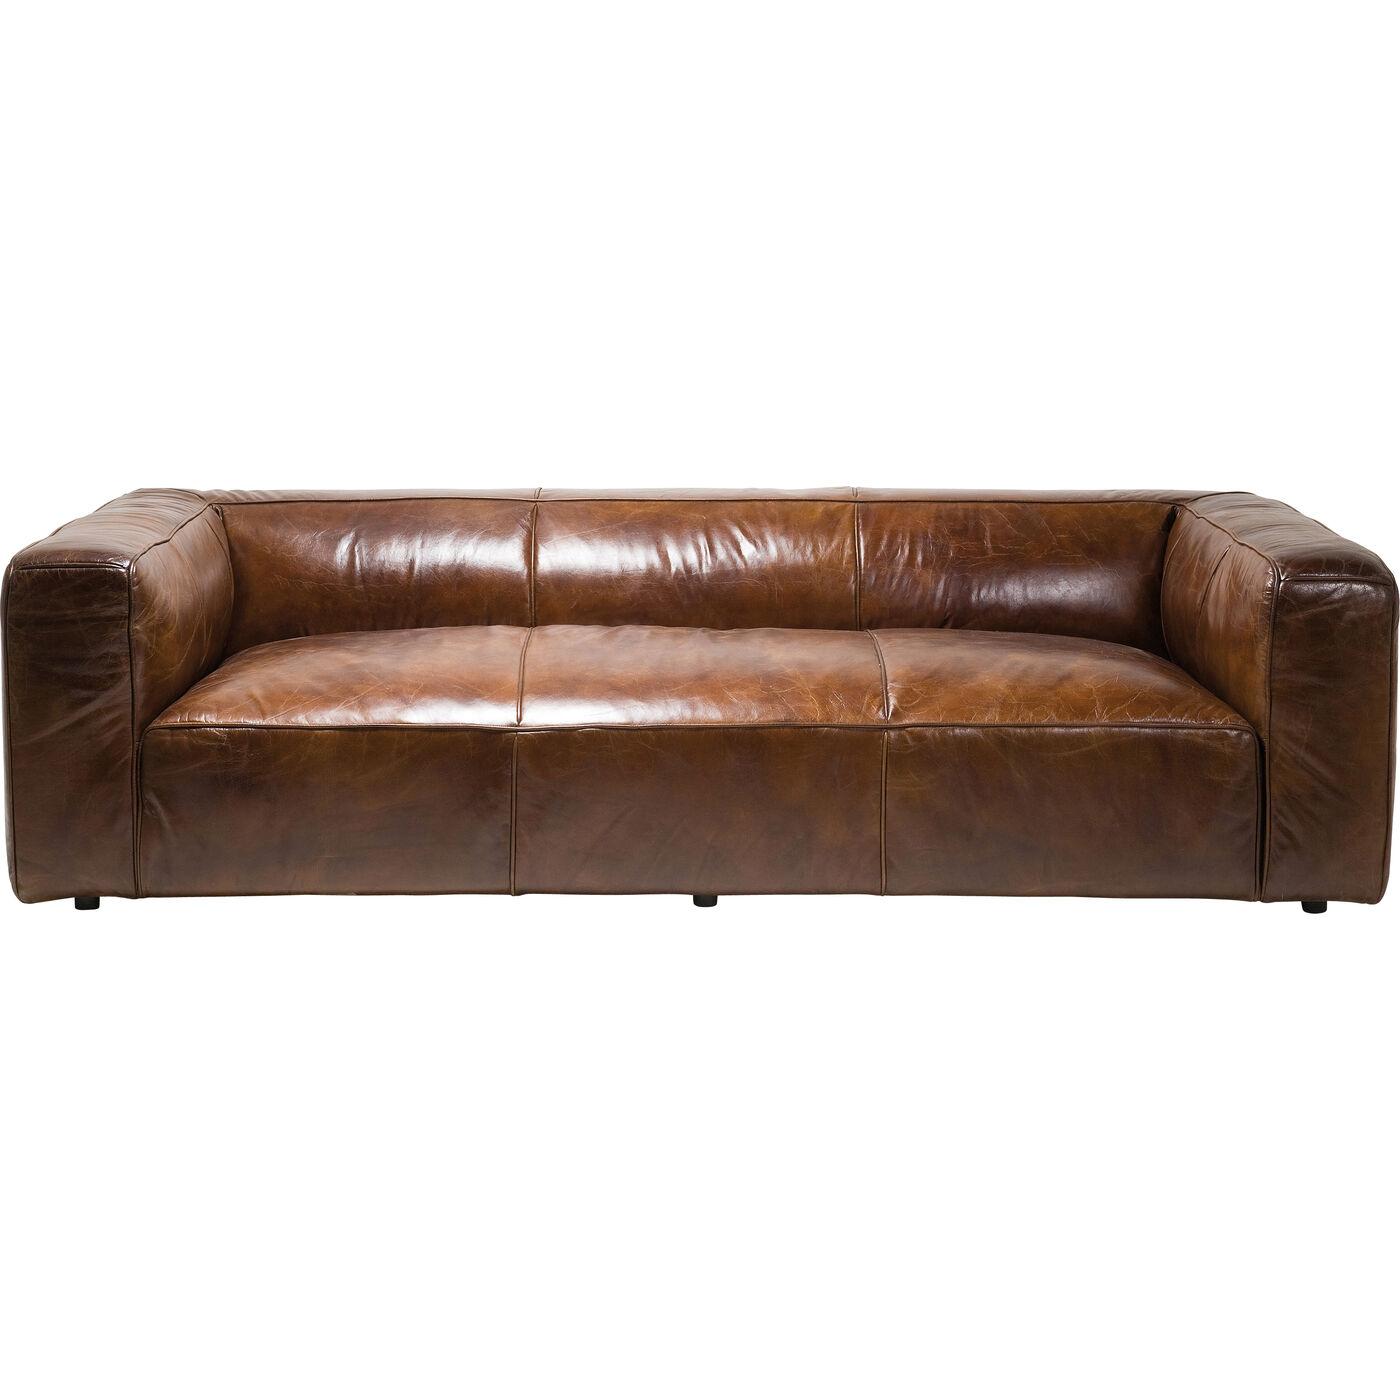 Sofa Cubetto 3-Sitzer